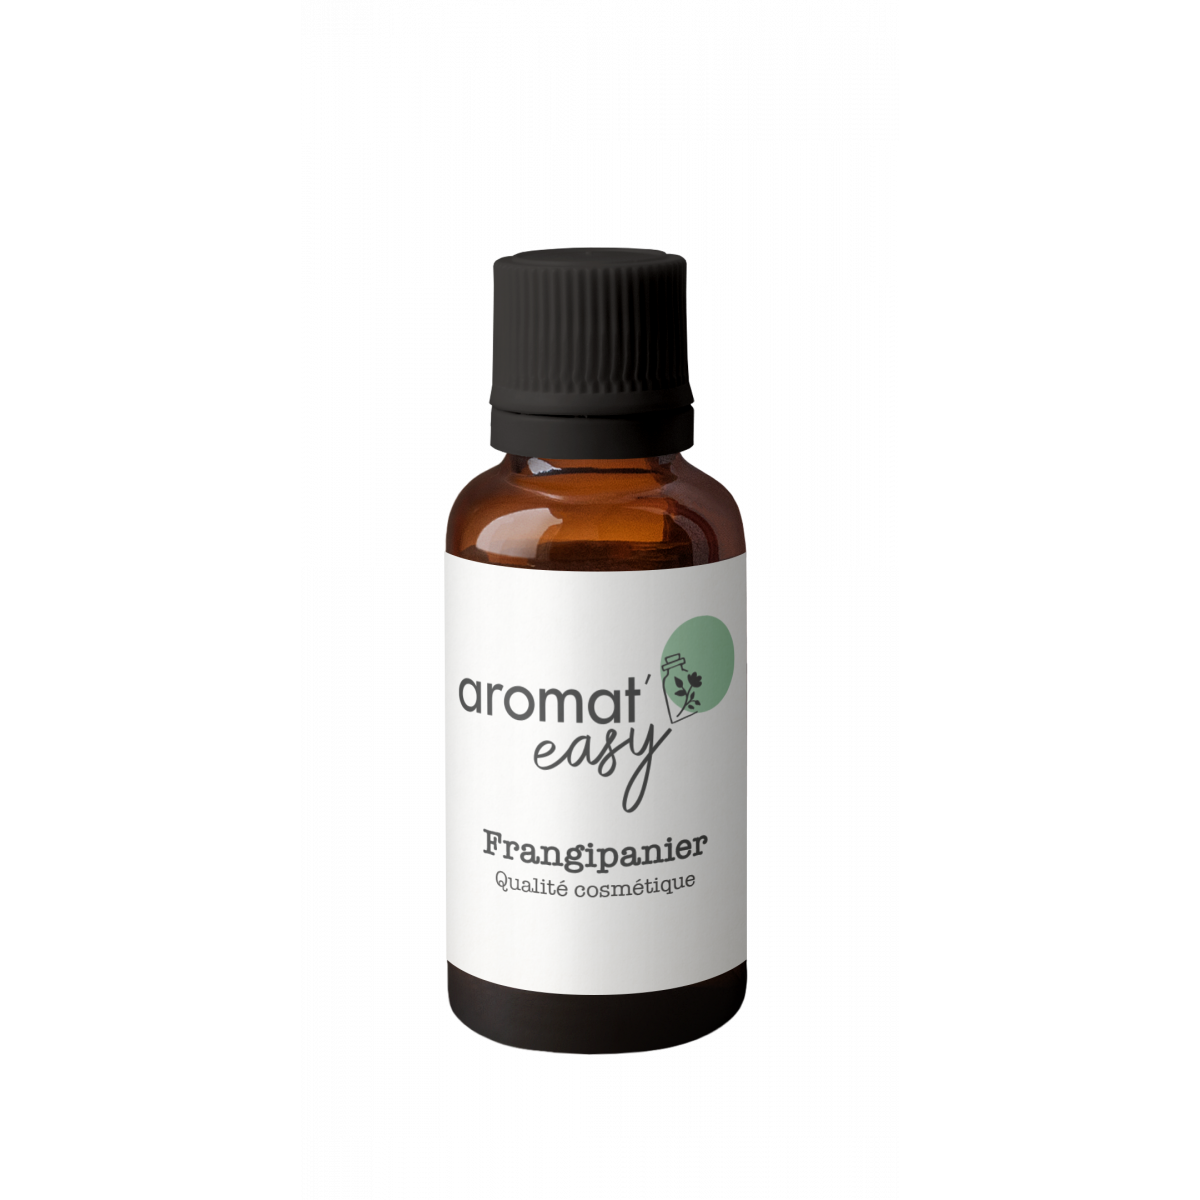 Fragrance Frangipanier